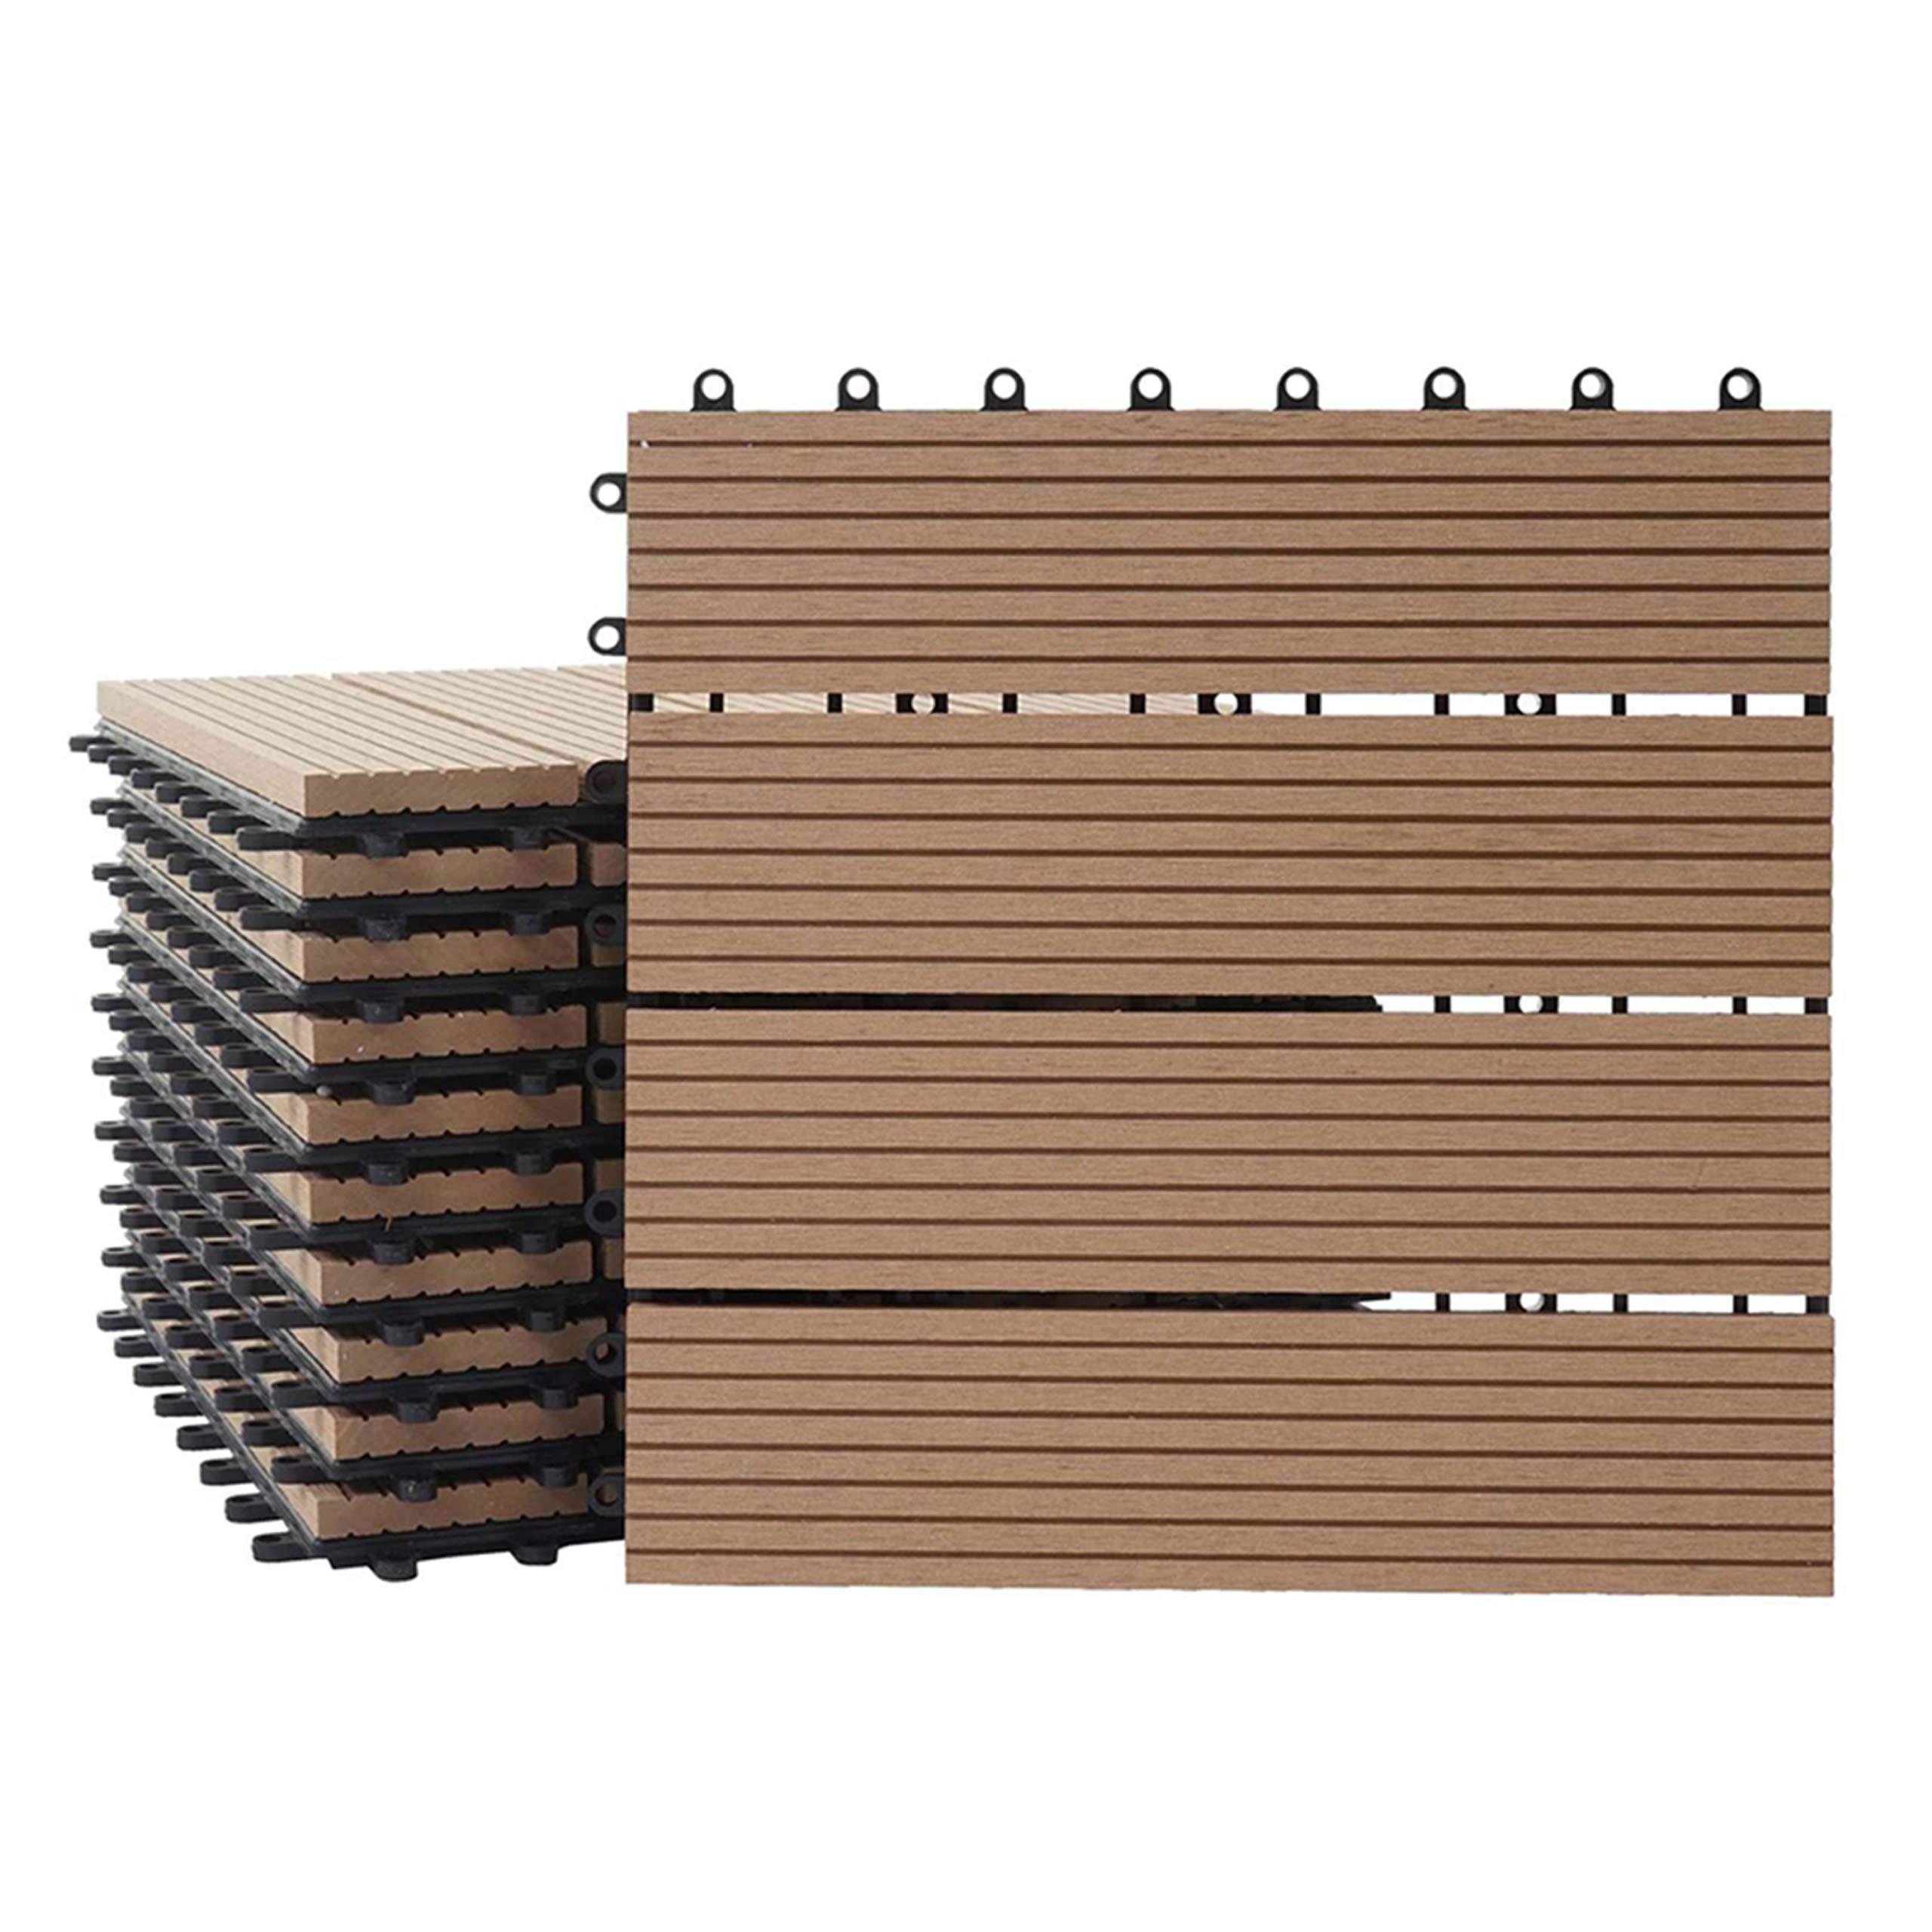 Holzoptik Balkon//Terrasse Mendler WPC Bodenfliese Rhone Teak linear 11x je 30x30cm = 1qm ~ Basis